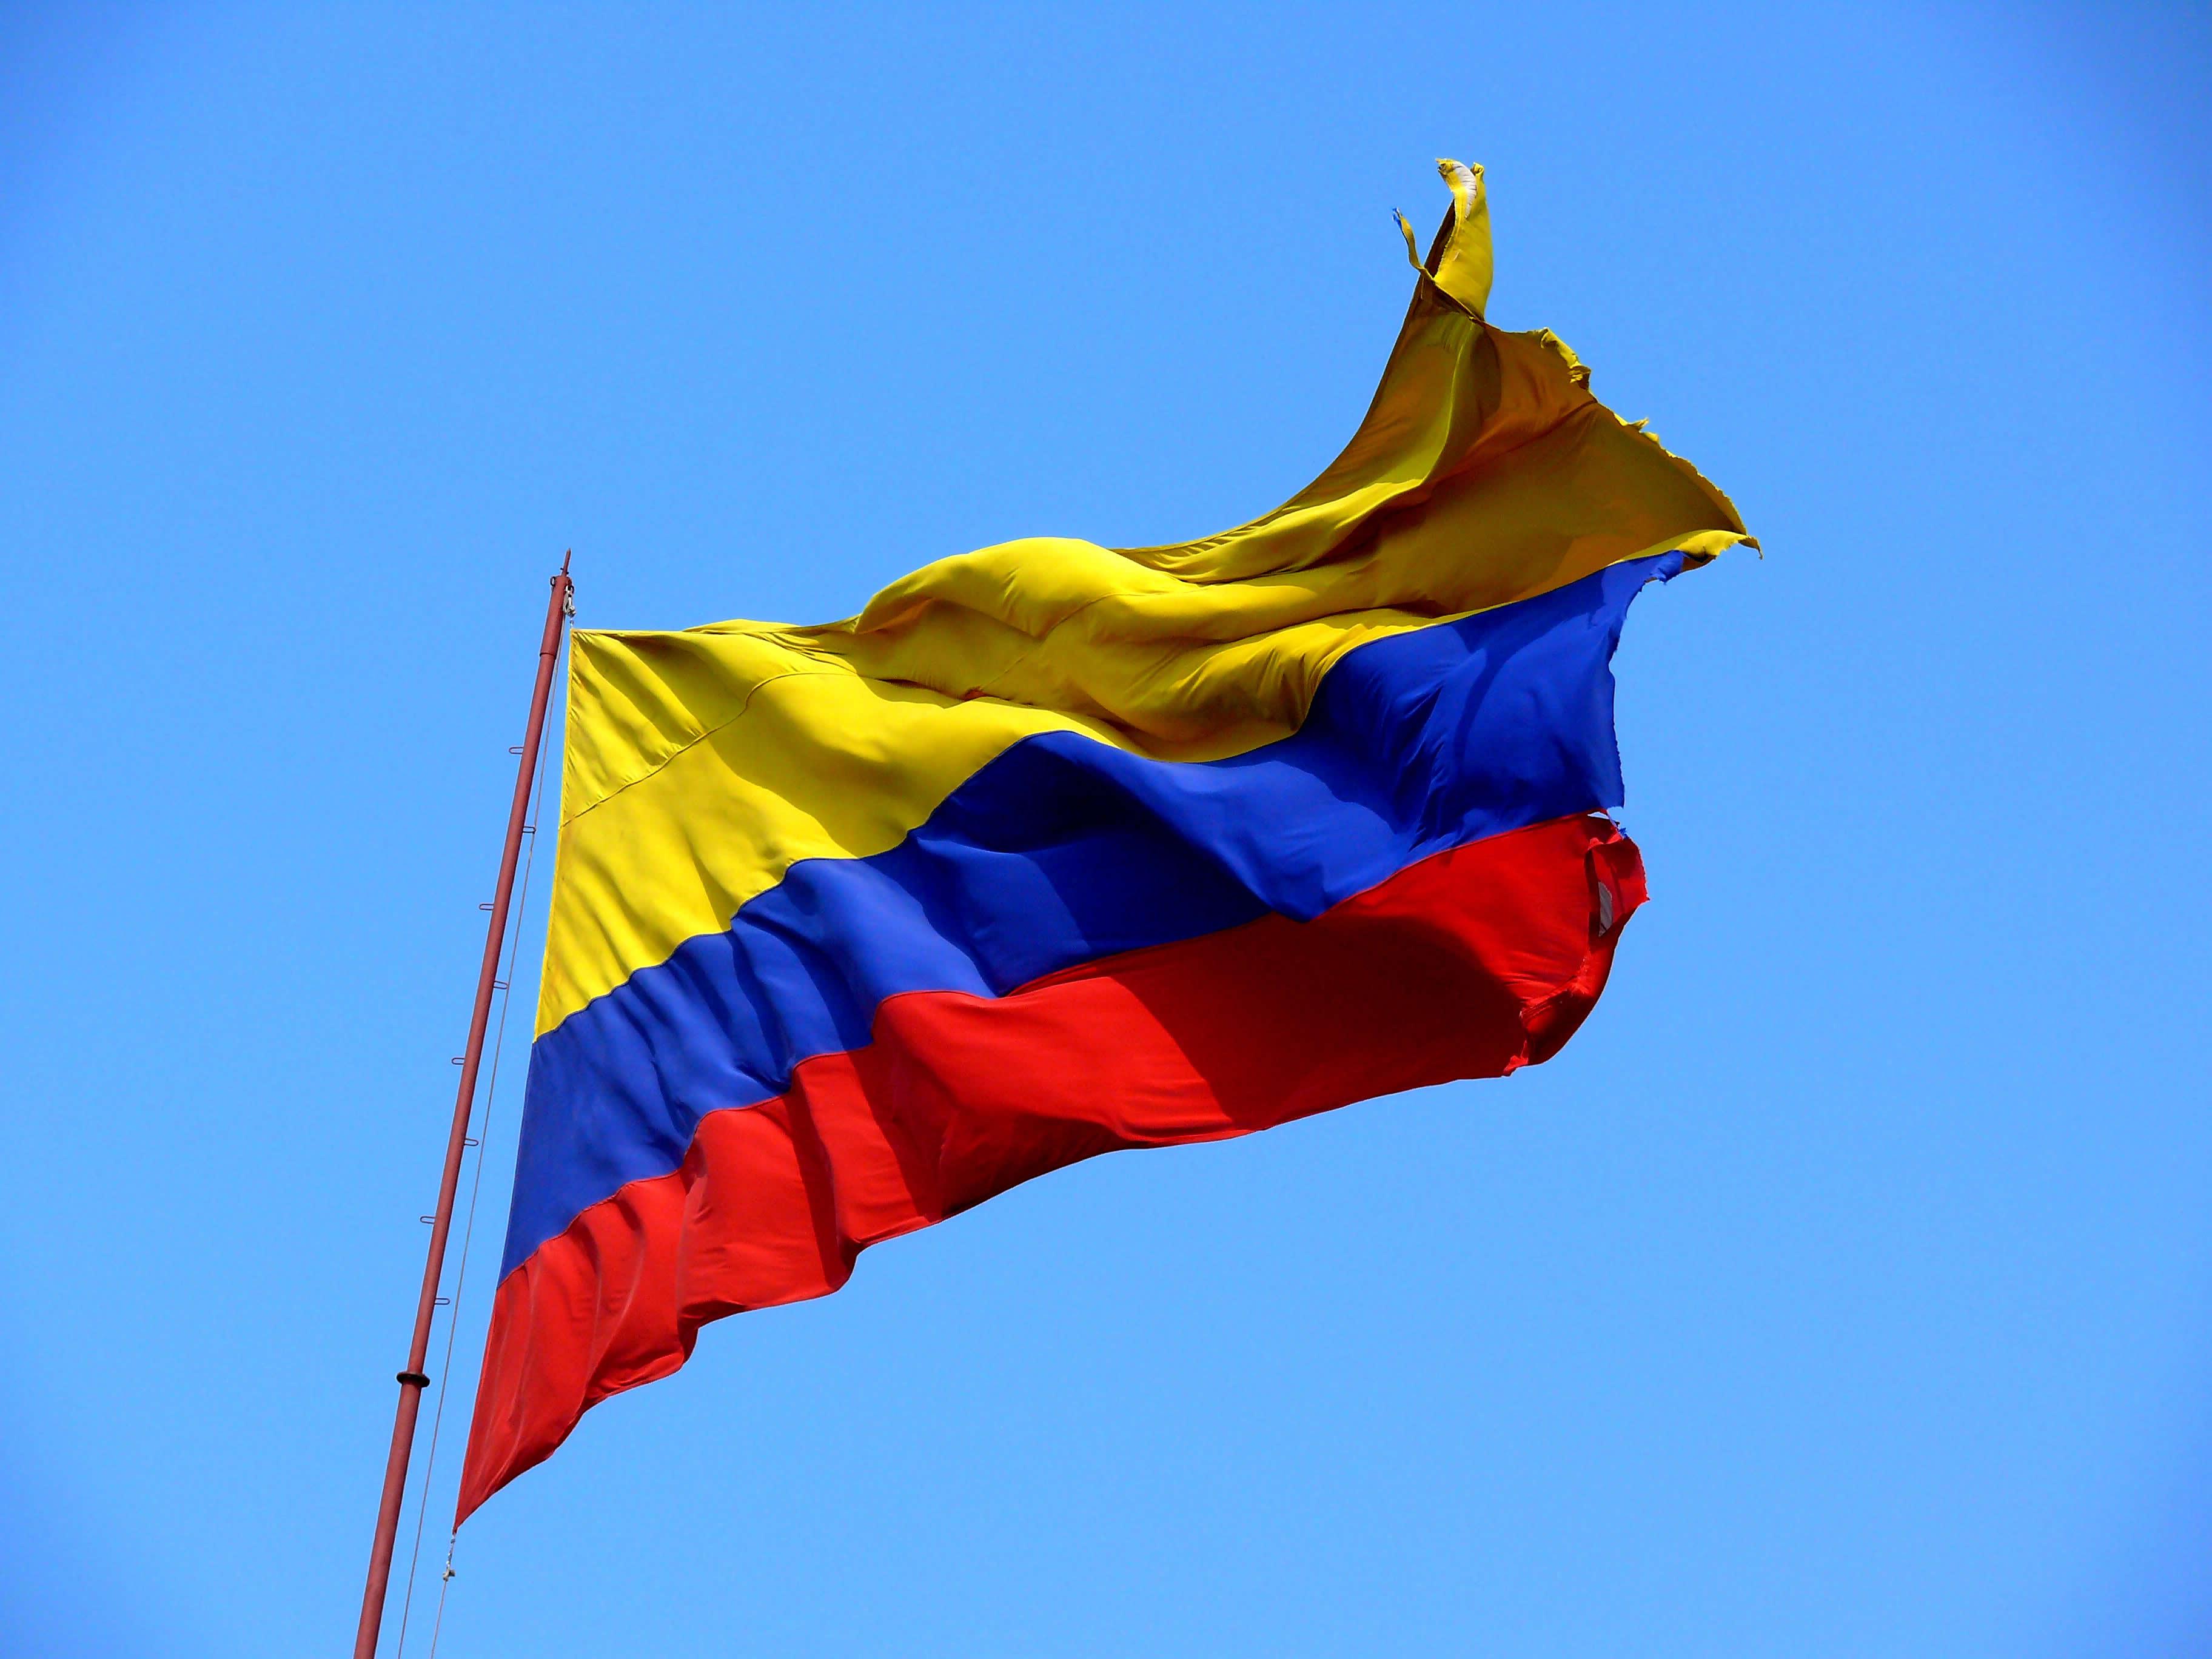 colombianflagflyinsky